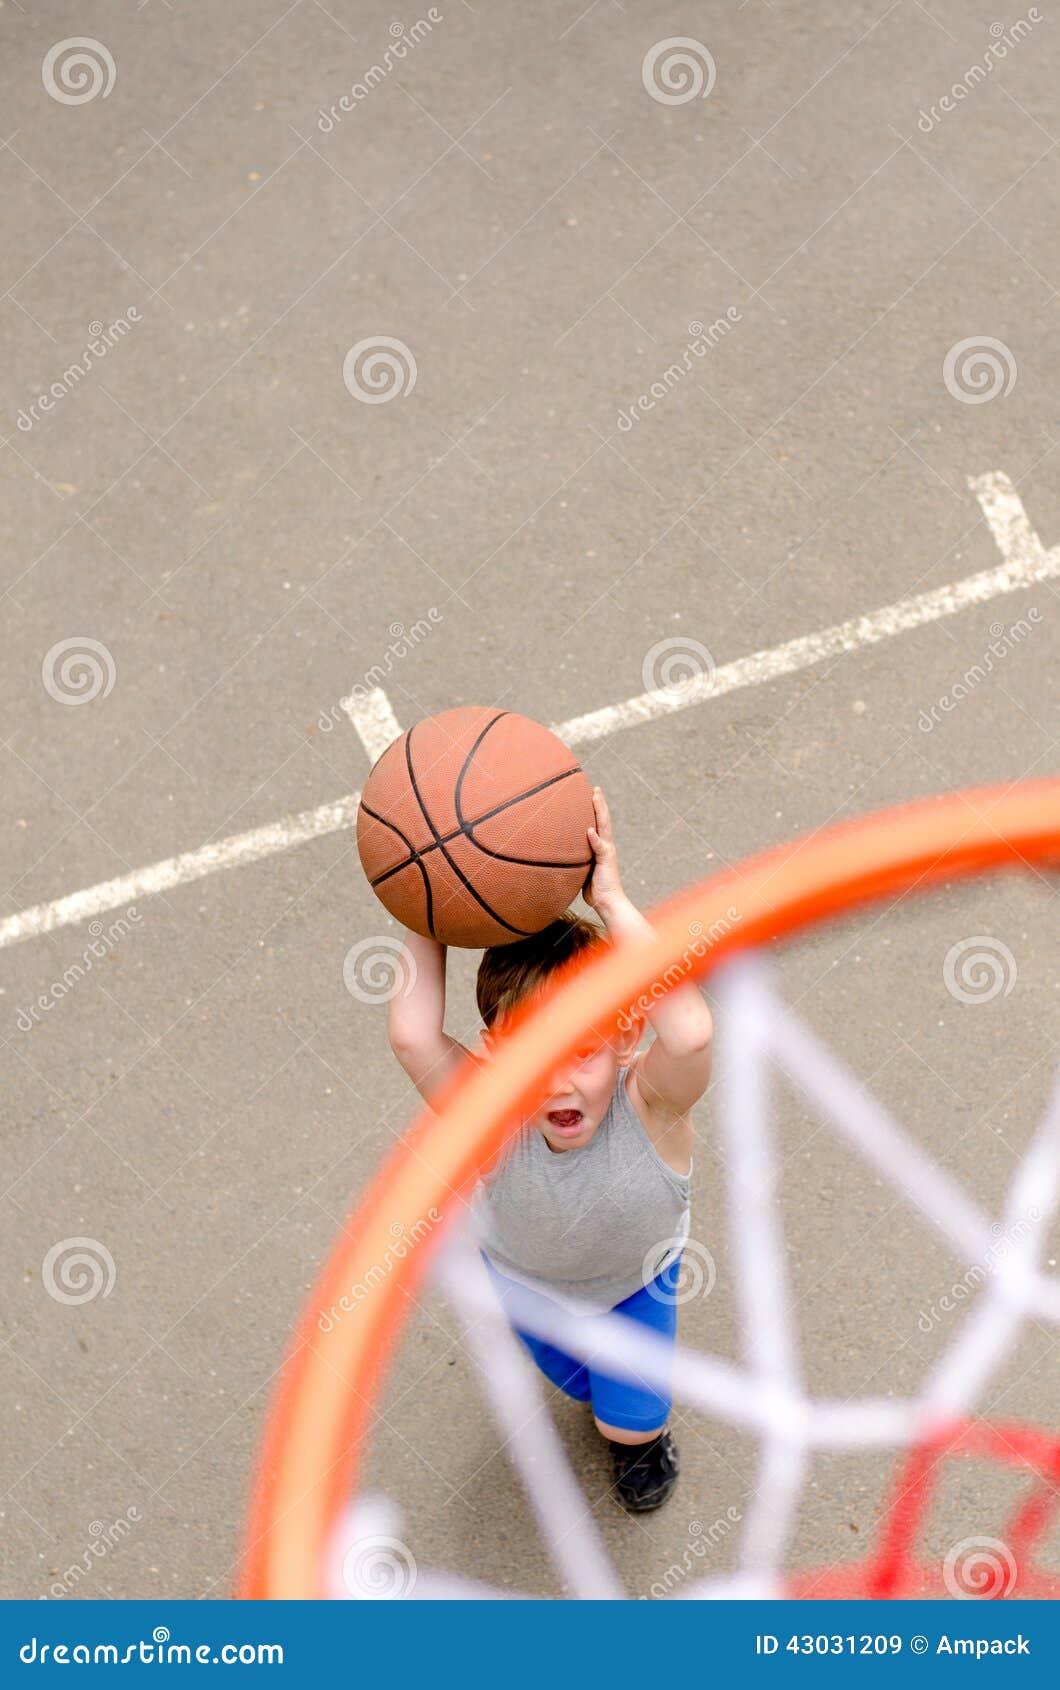 Young Boy Playing Basketball Stock Image - Image of pants ...